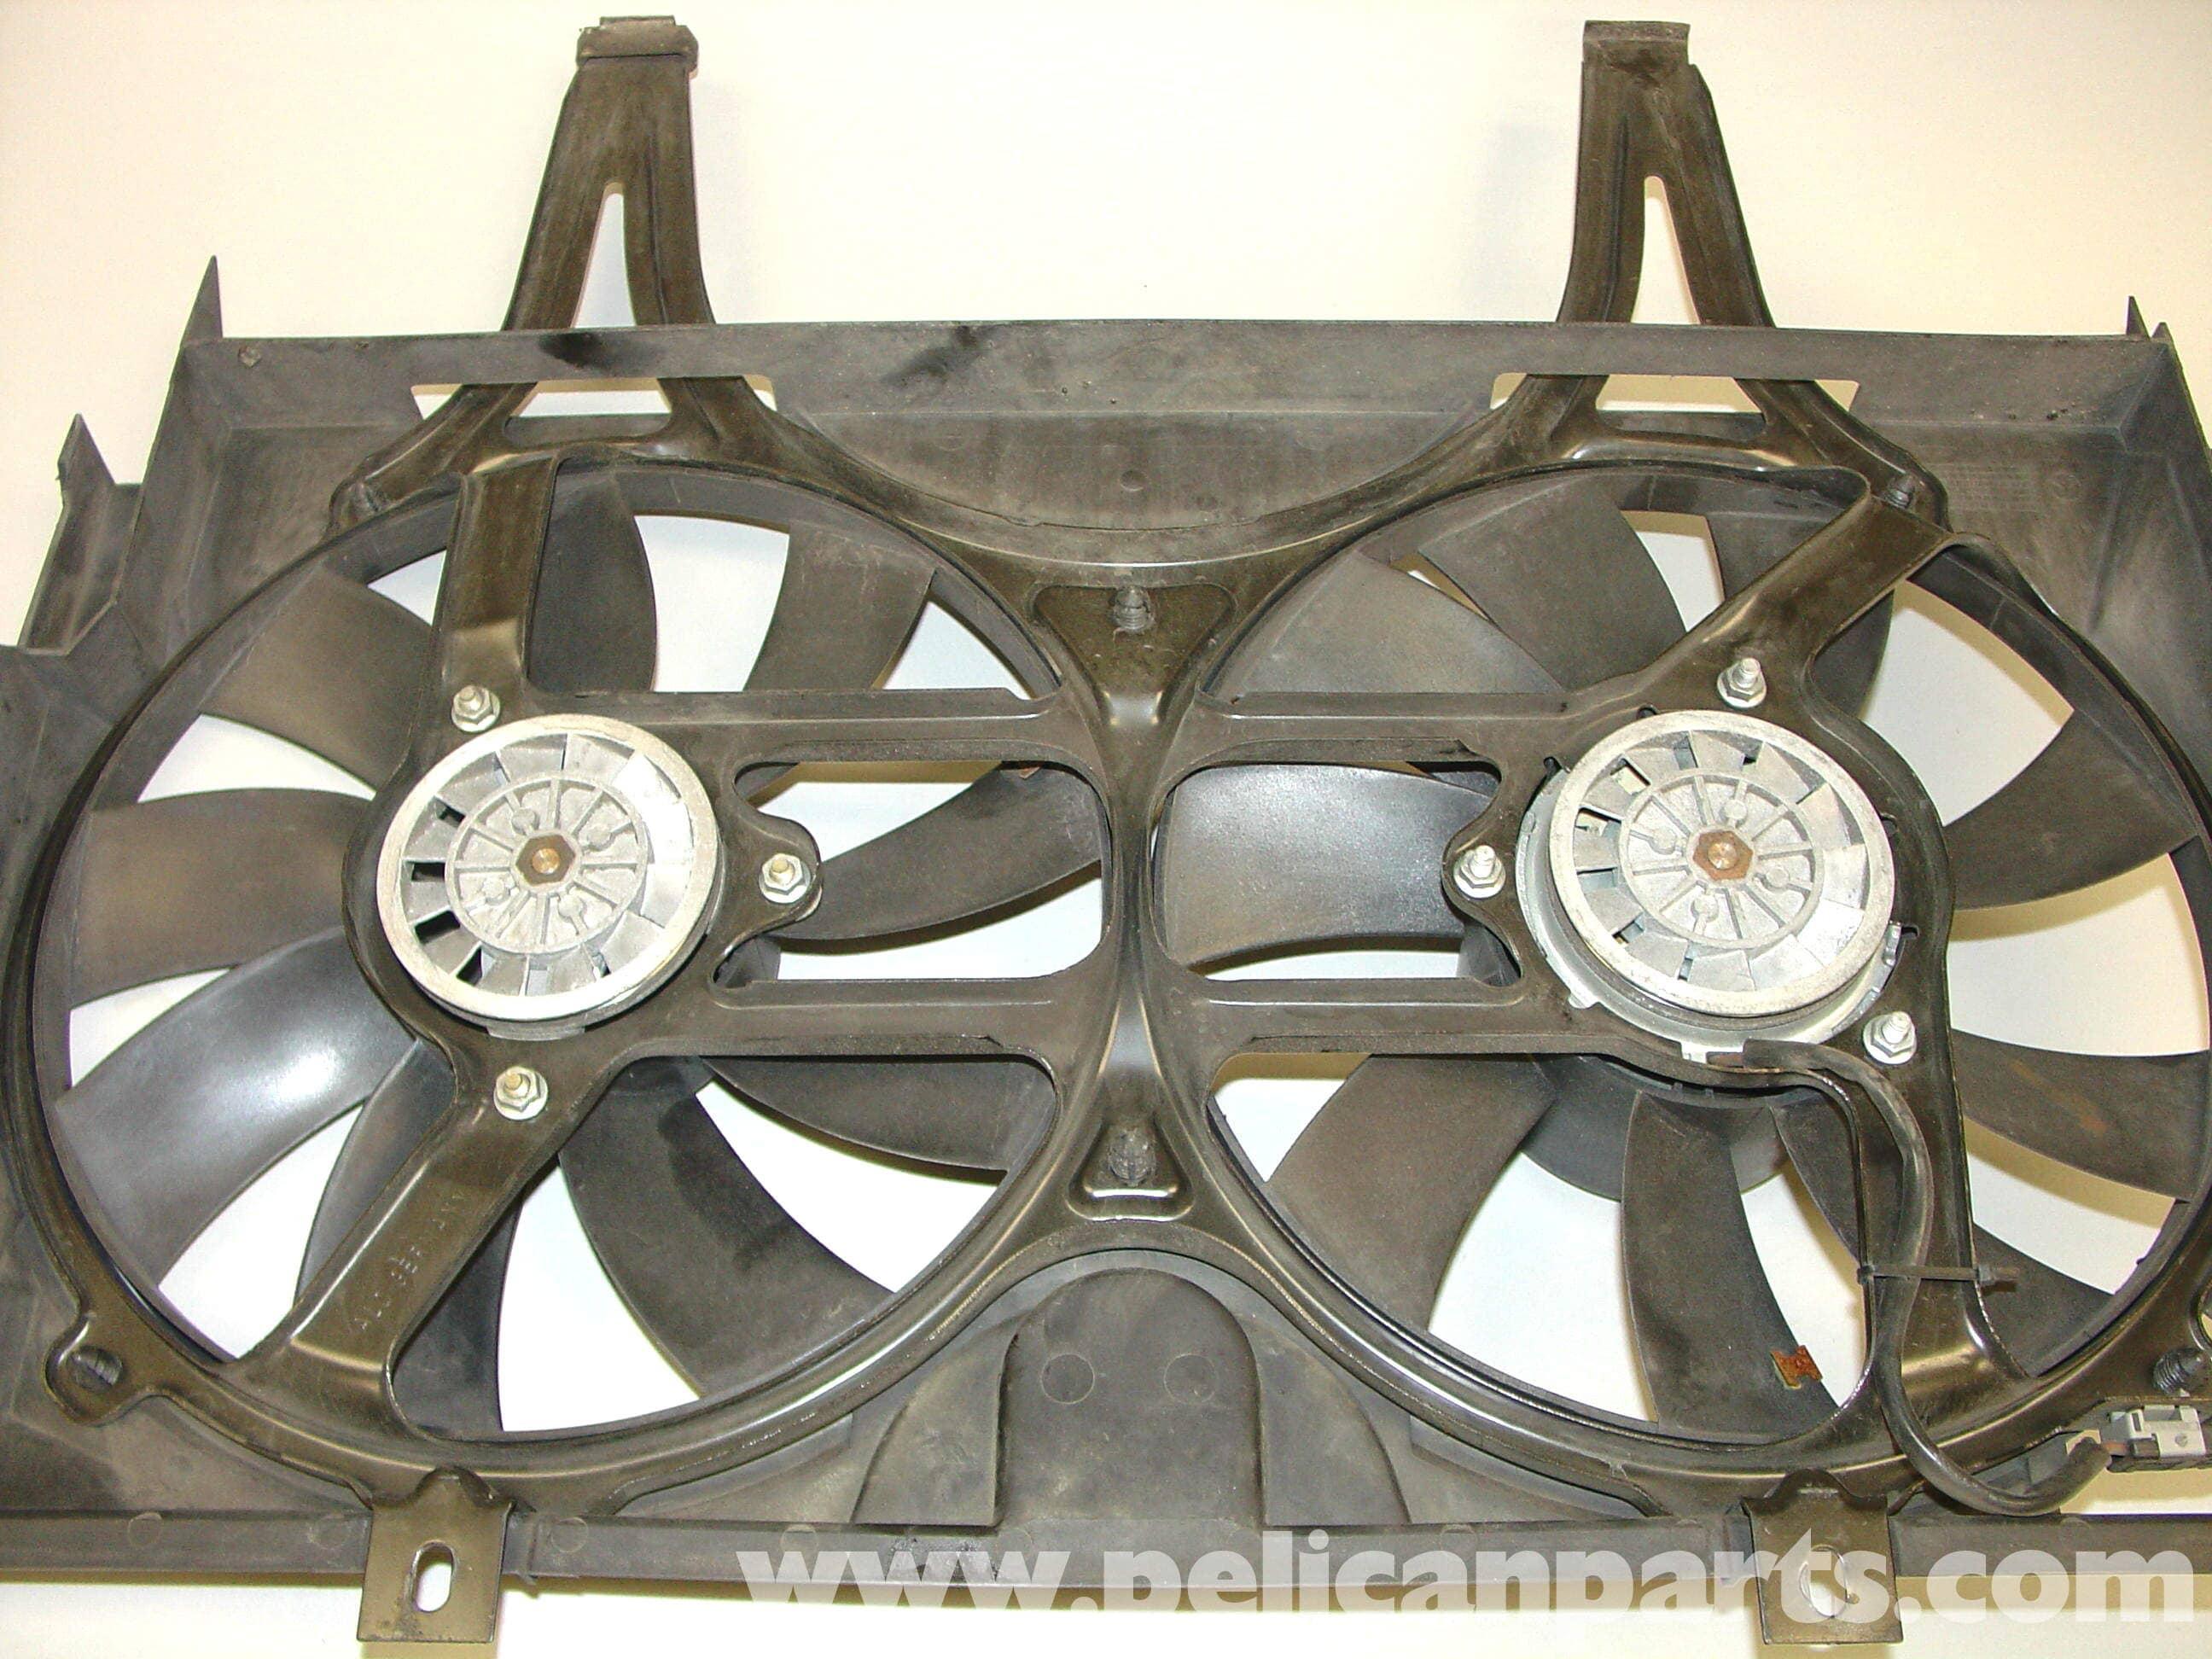 Mercedes benz w210 auxiliary cooling fan belt replacement for Replacement parts for mercedes benz